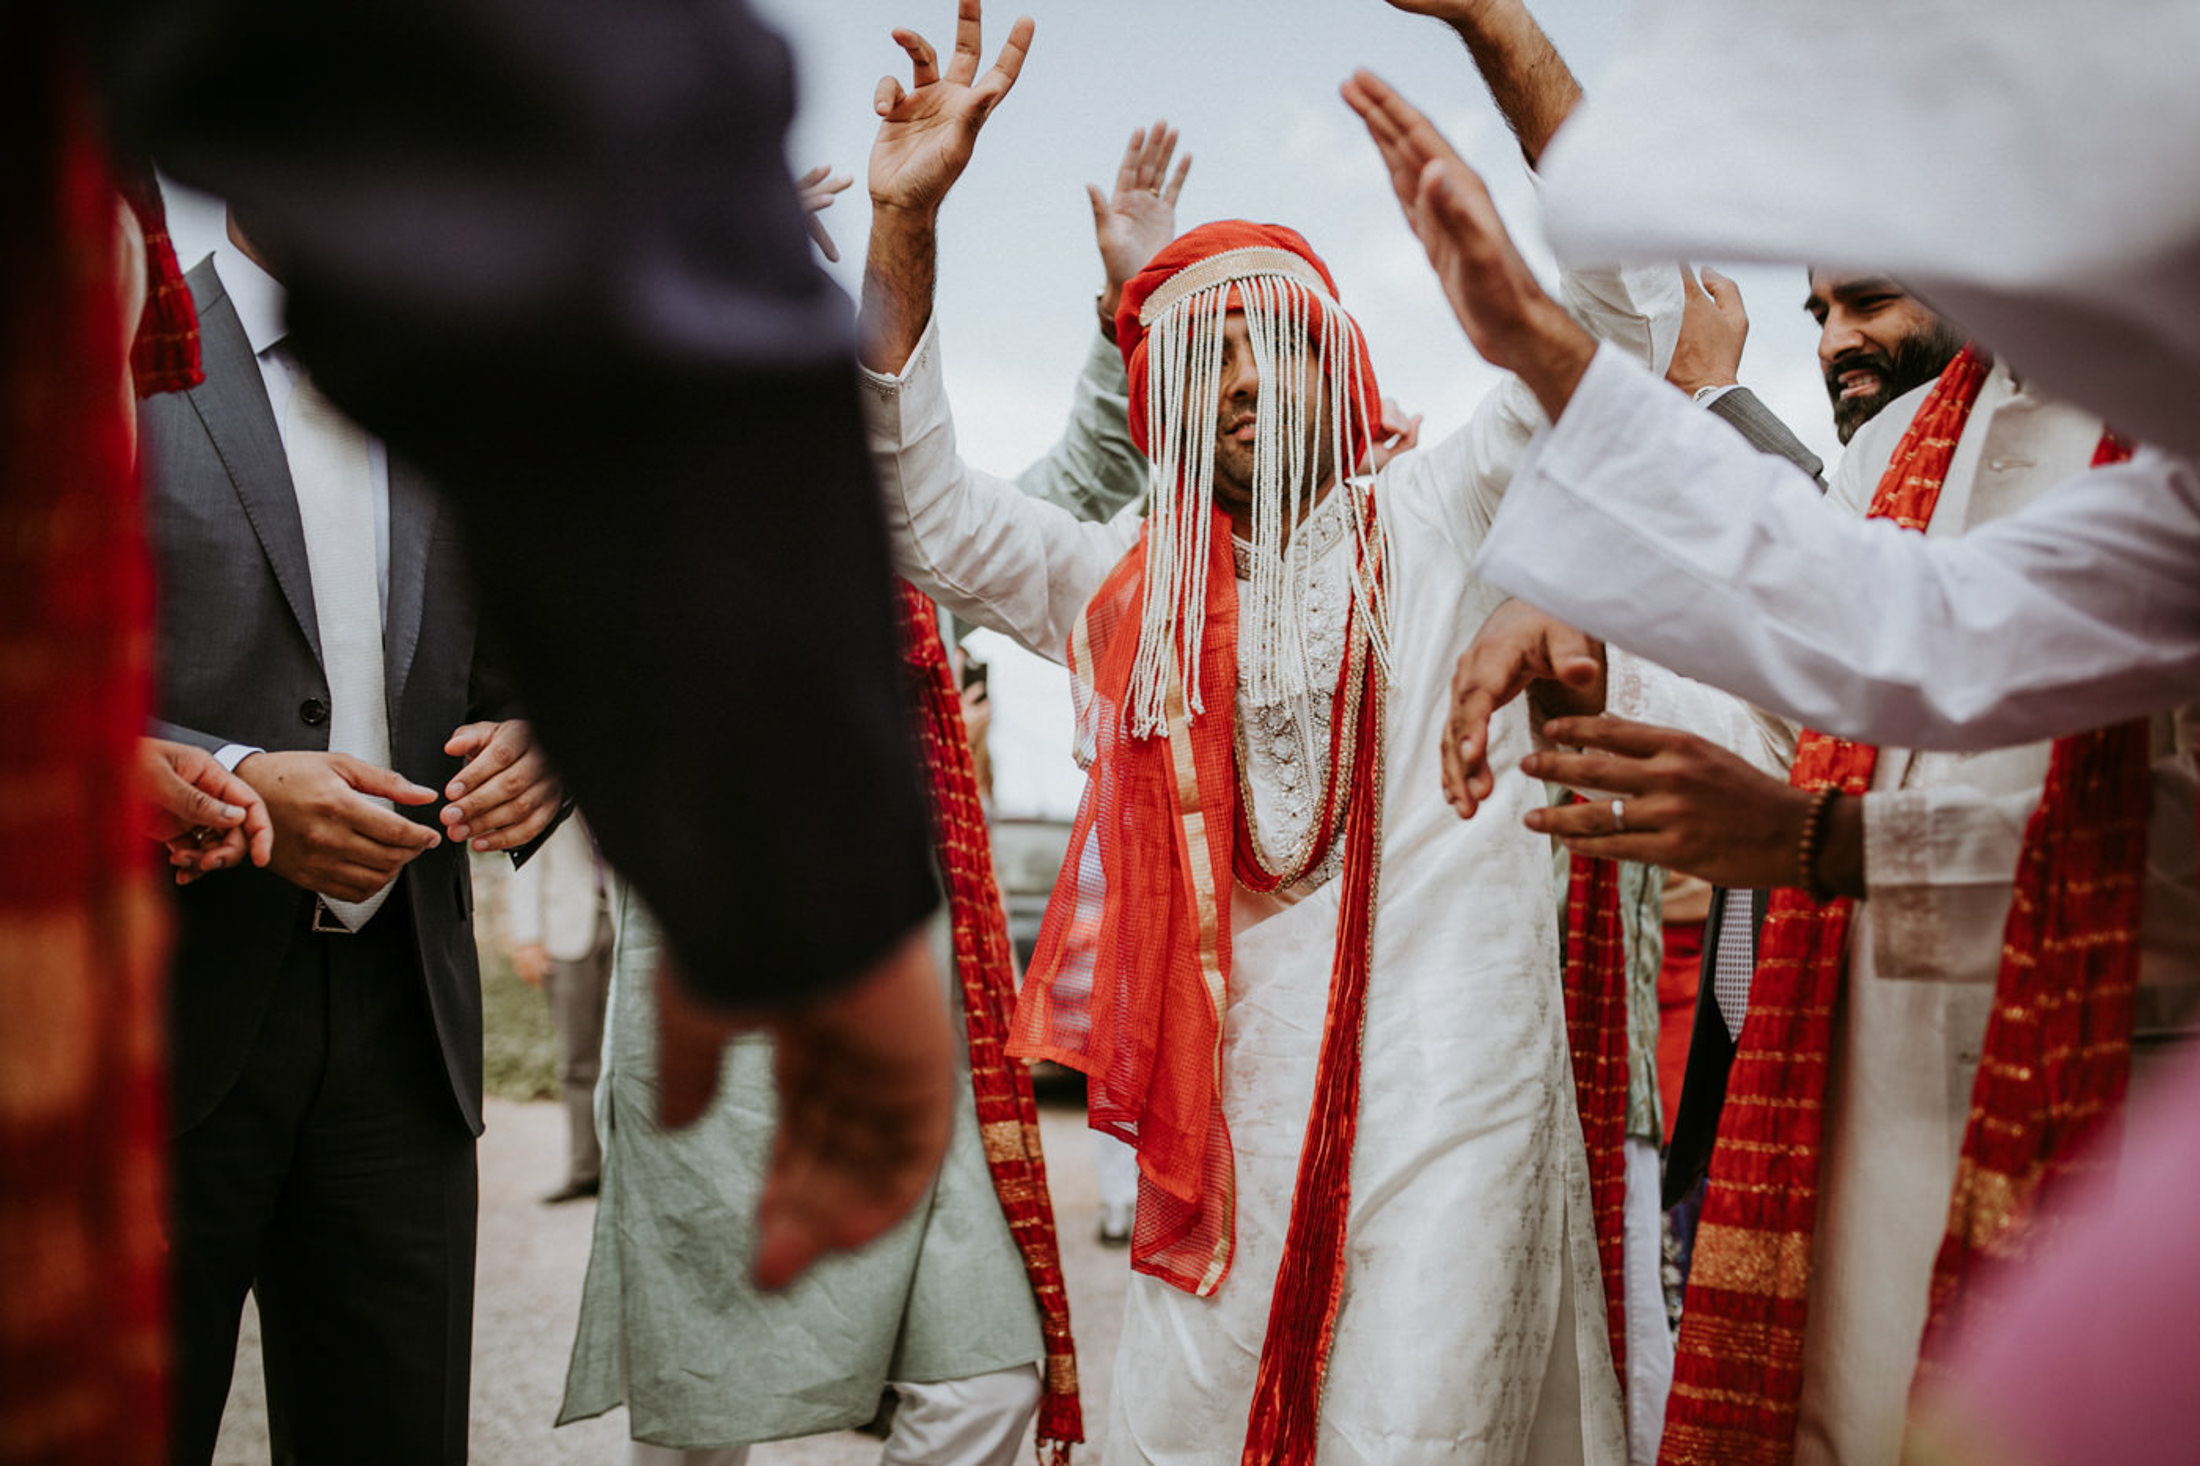 Wedding_Photographer_Mallorca_Daniela-Marquardt_Photography_New_York_Iceland_Tuscany_Santorini_Portugal_Austria_Bavaria_Elopement_Hochzeitsfotograf_AntjeRajat2_33